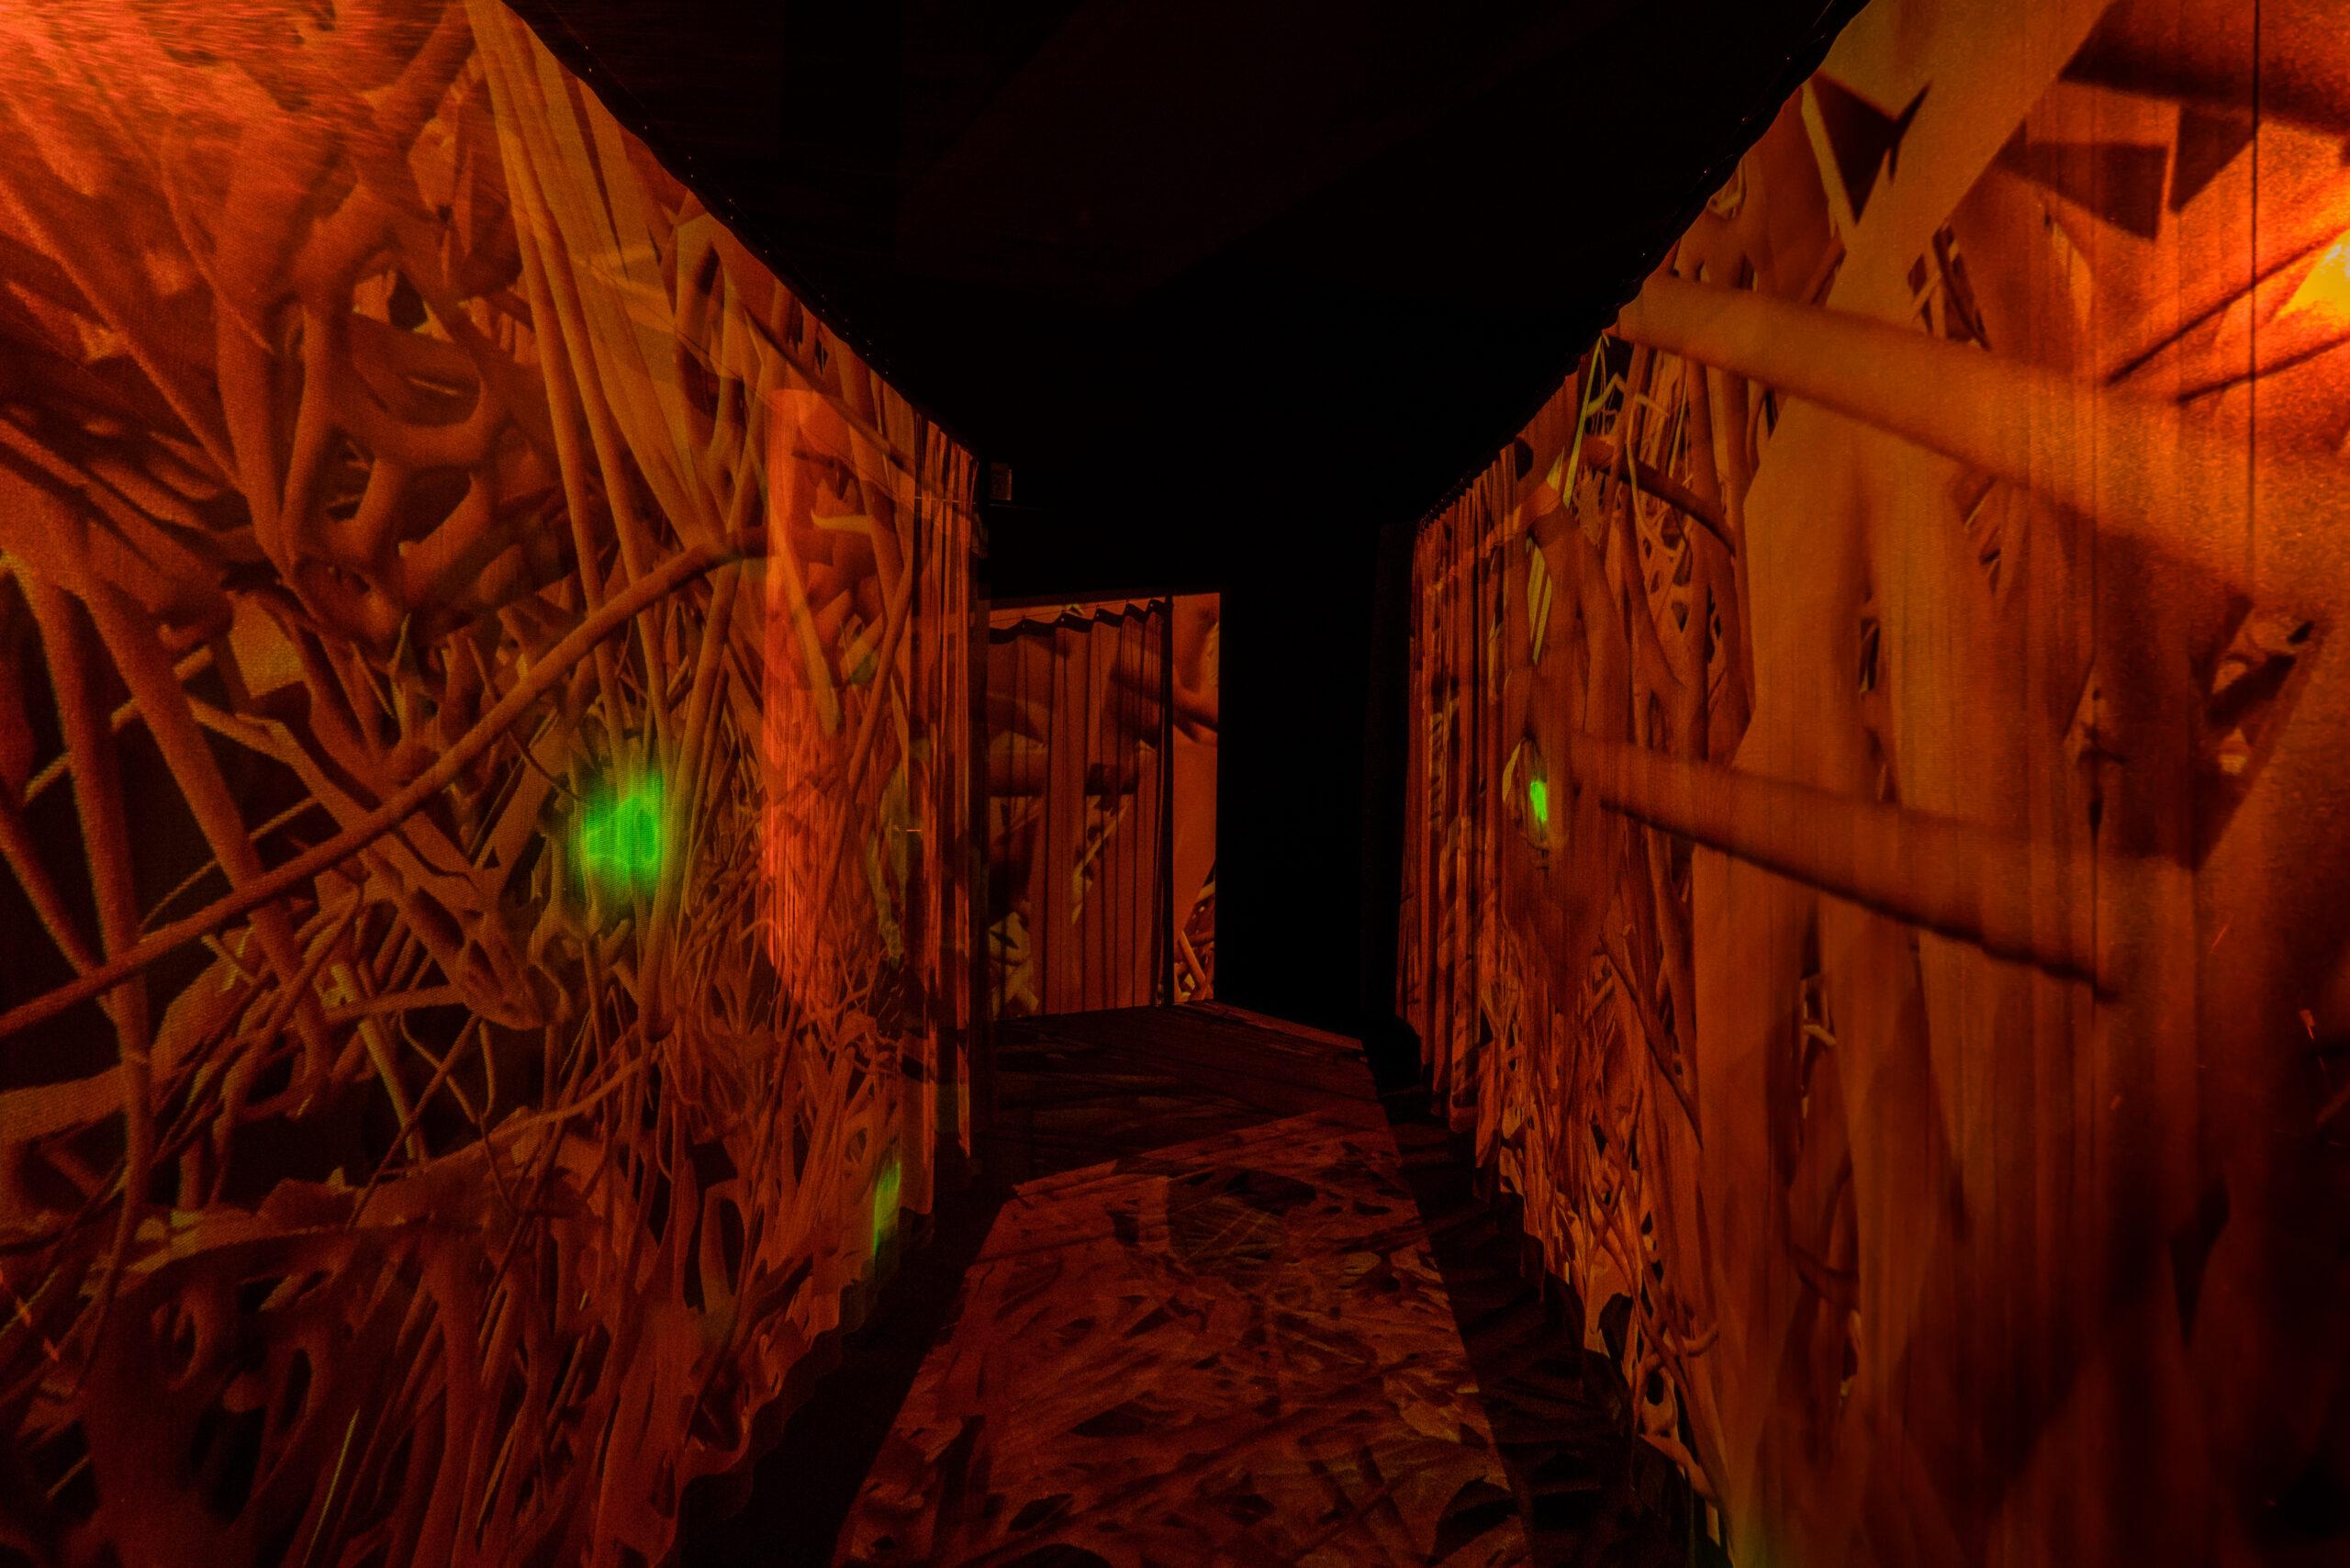 "Susanne M. Winterling: ""TEMPERATE. under your skin, nano carriers directed through the web of life"", Installationsansicht, Courtesy Susanne M. Winterling / Schering Stiftung © VG Bild-Kunst, Bonn 2021"